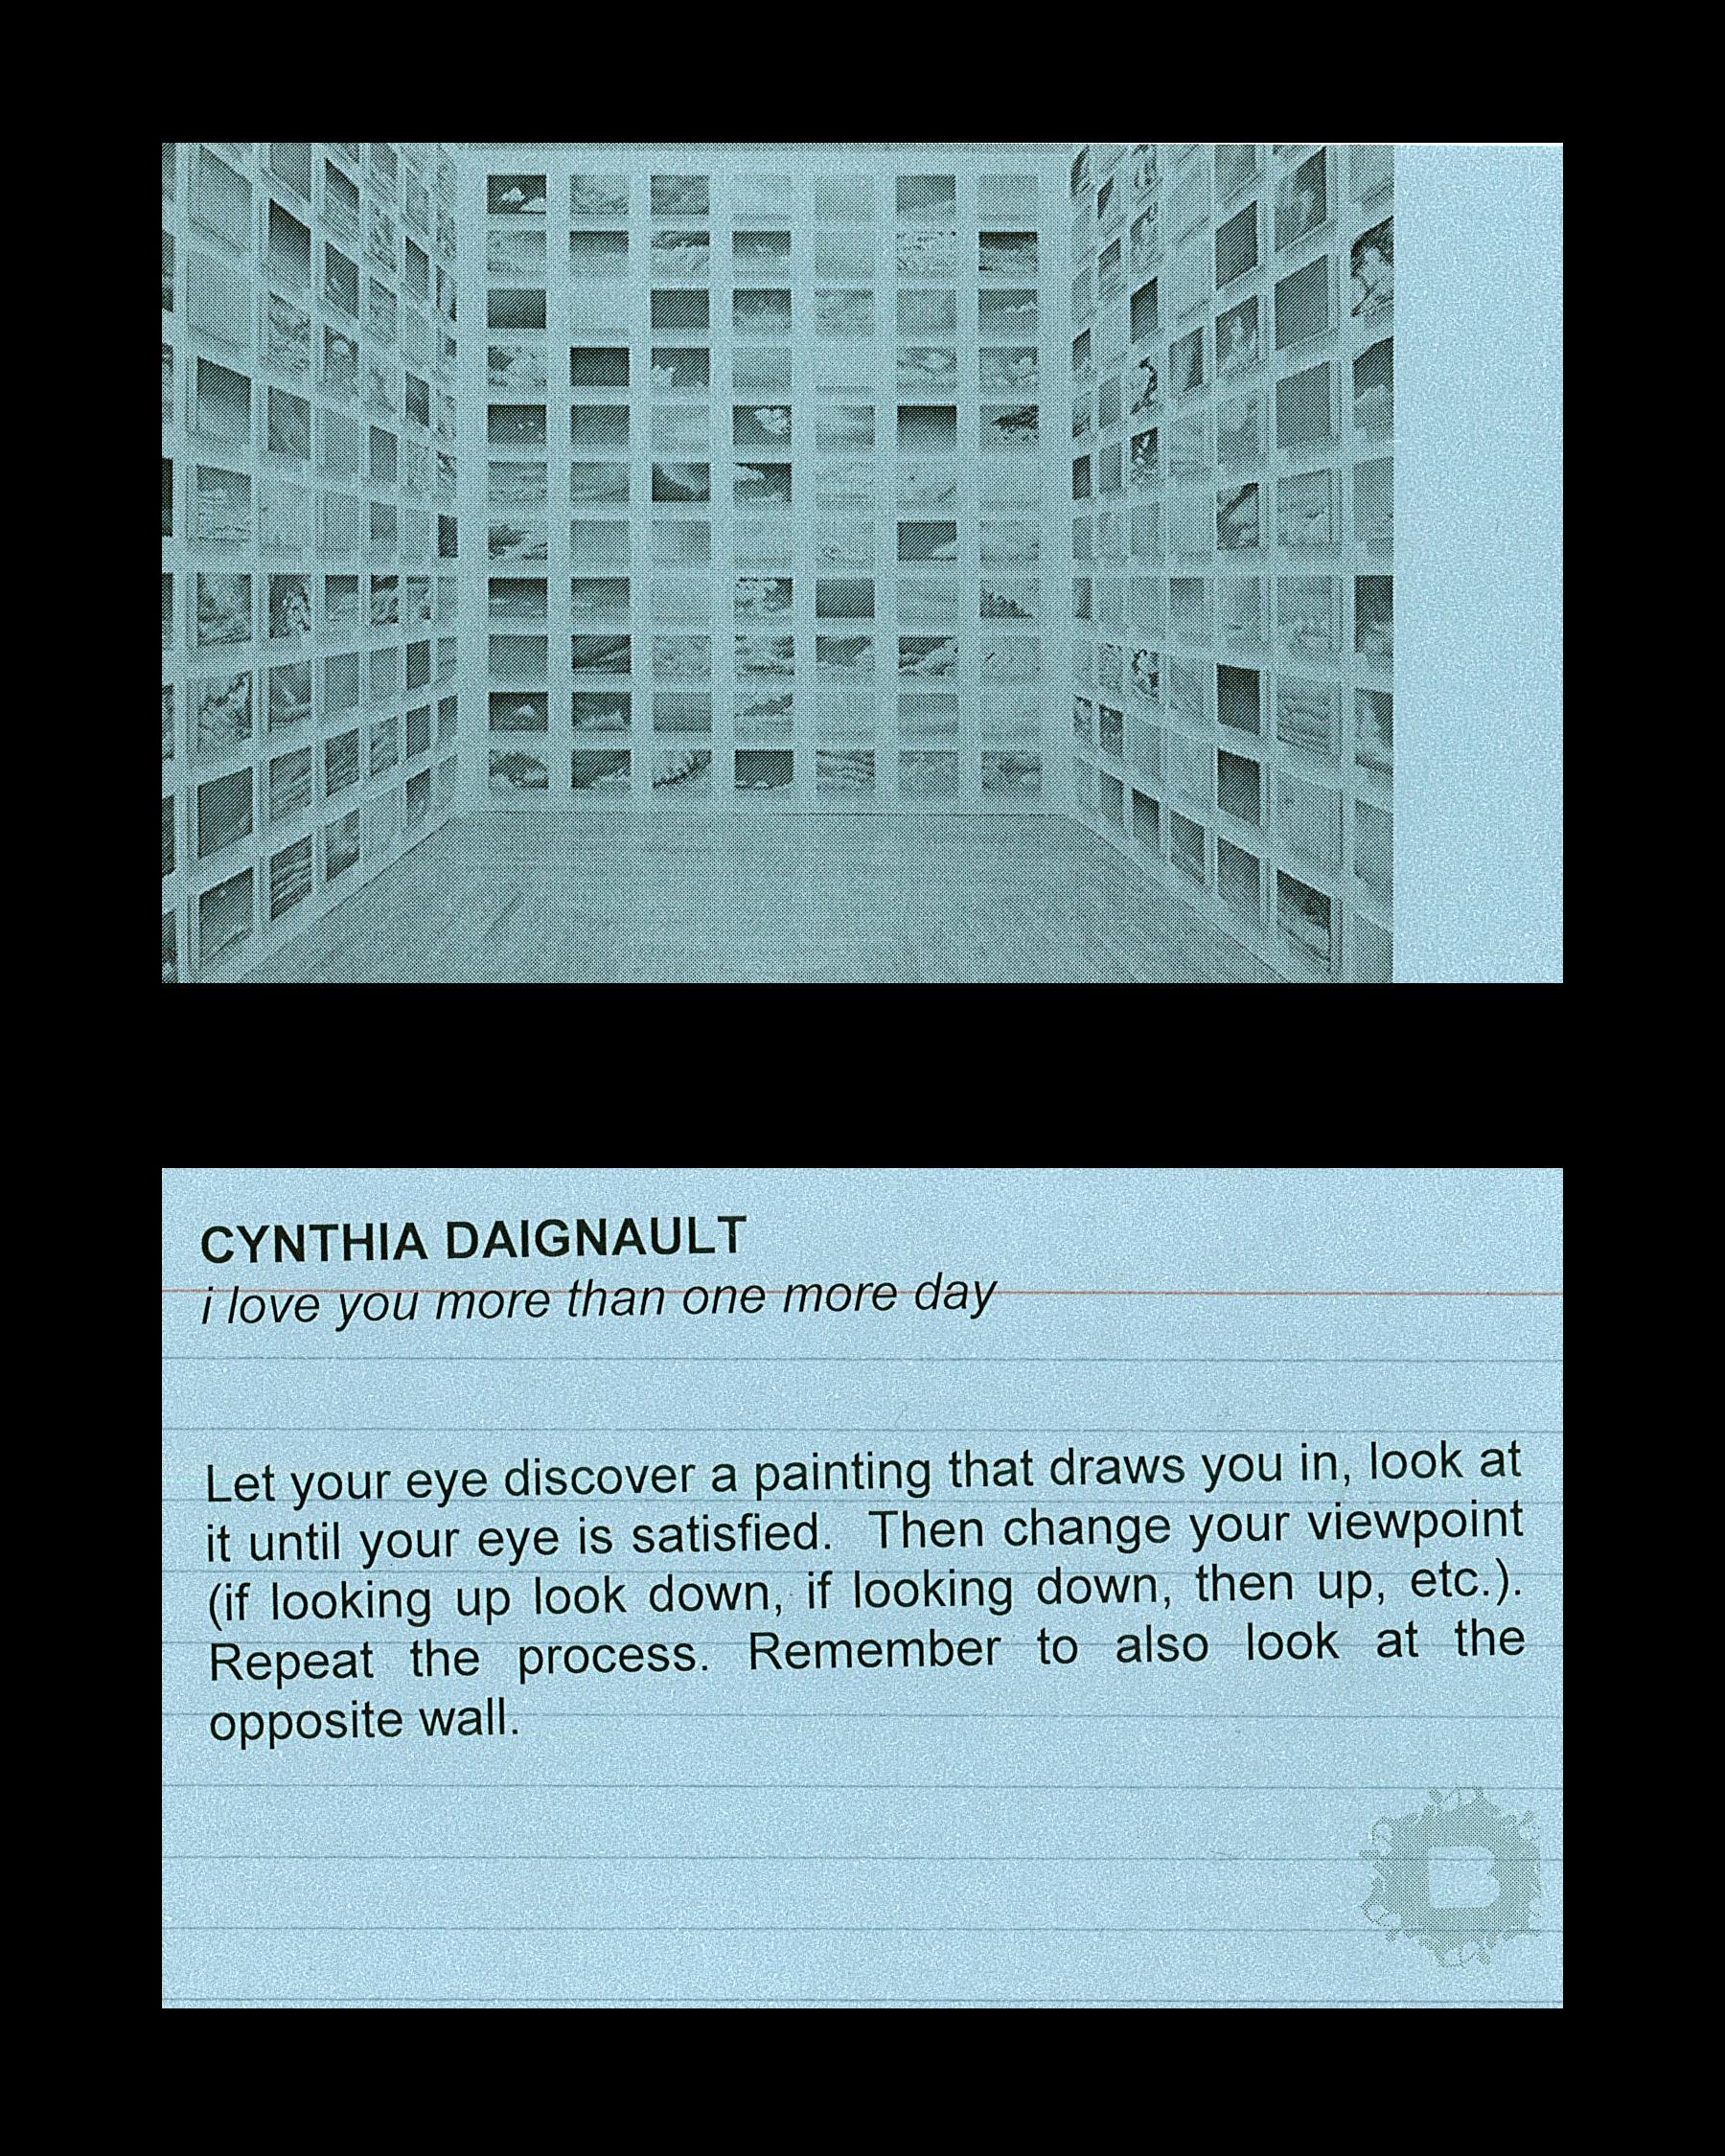 cyoaa daignault immersive.jpg